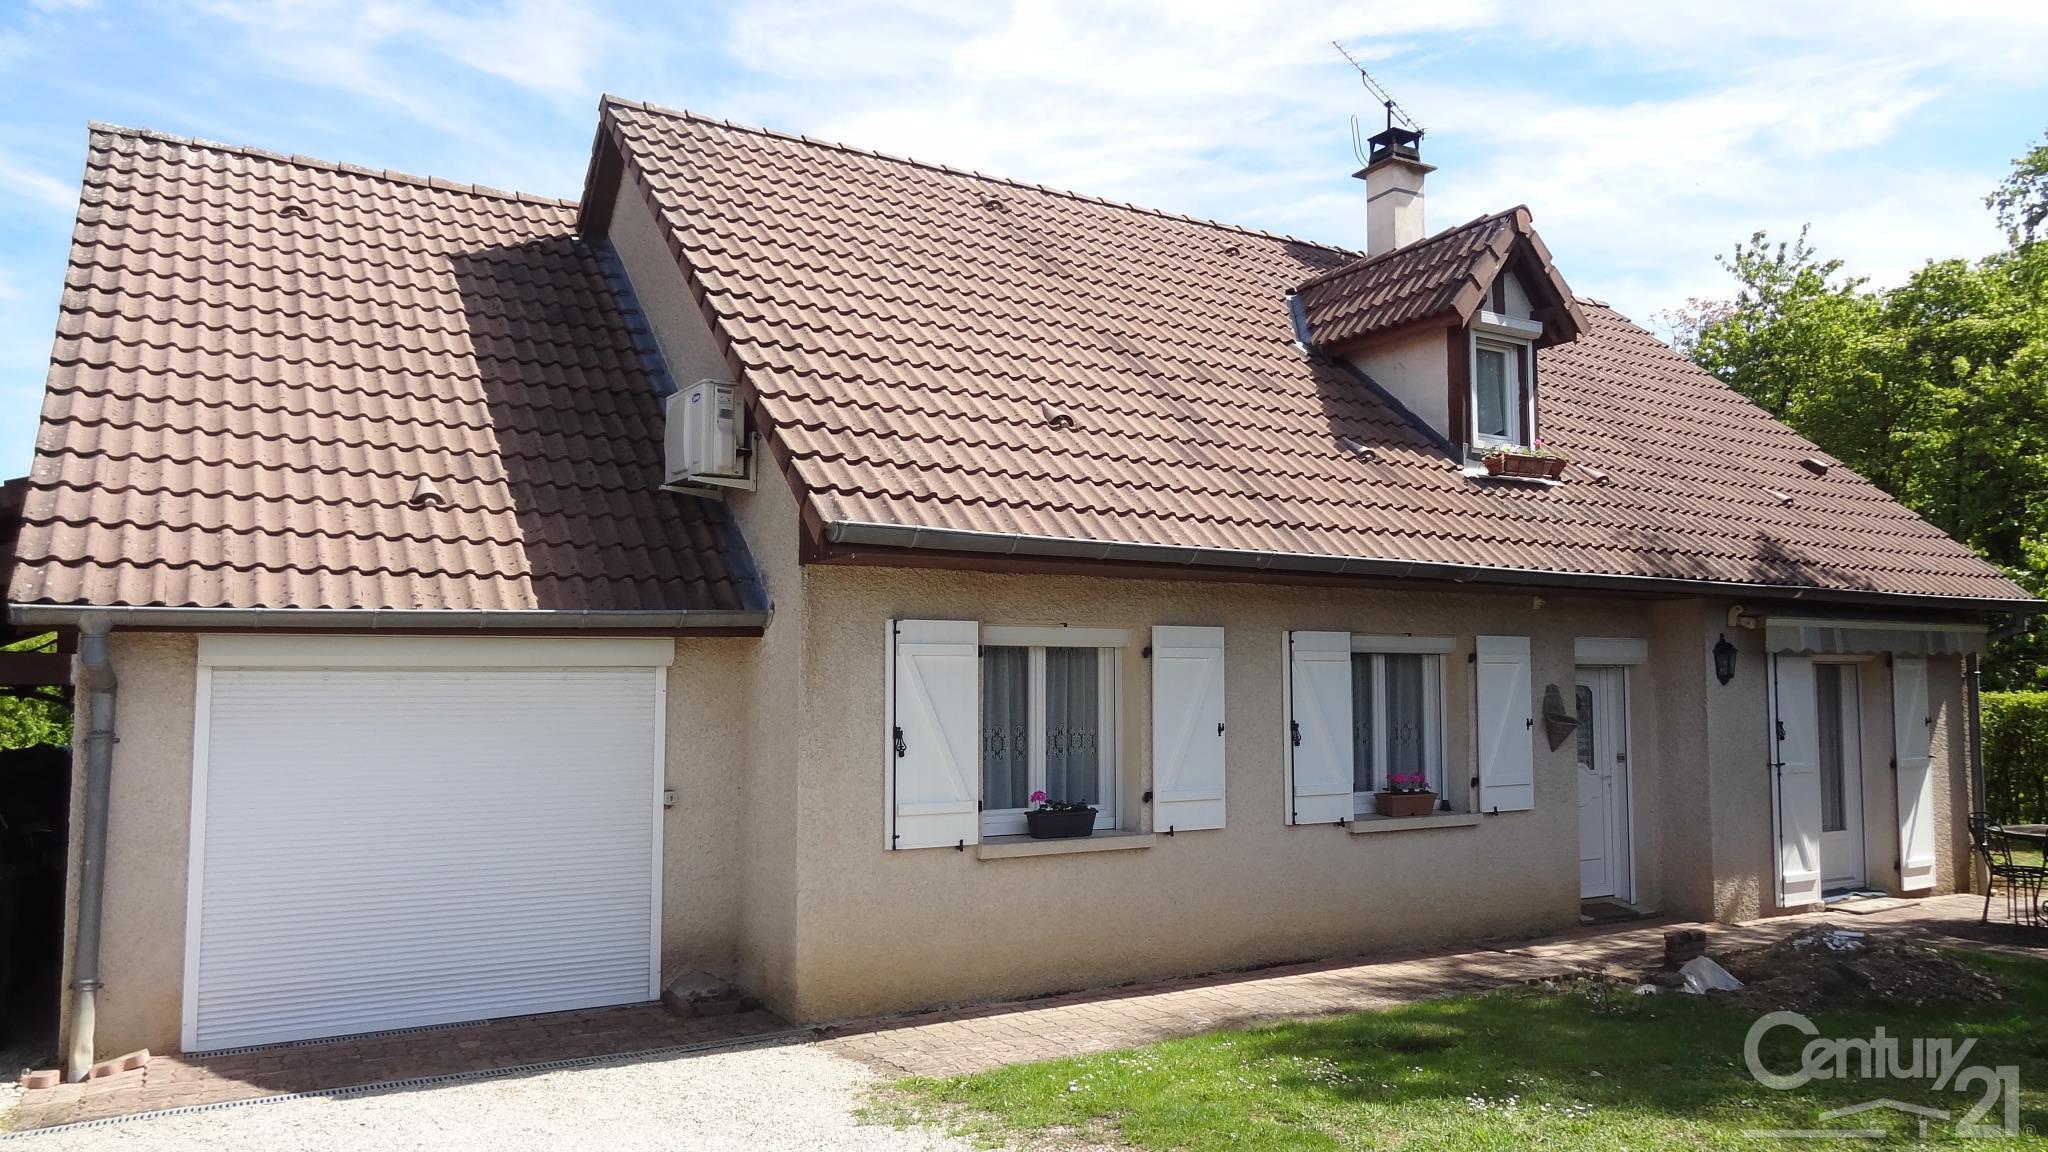 Annonce vente maison corgoloin 21700 175 m 205 000 for A vente maison